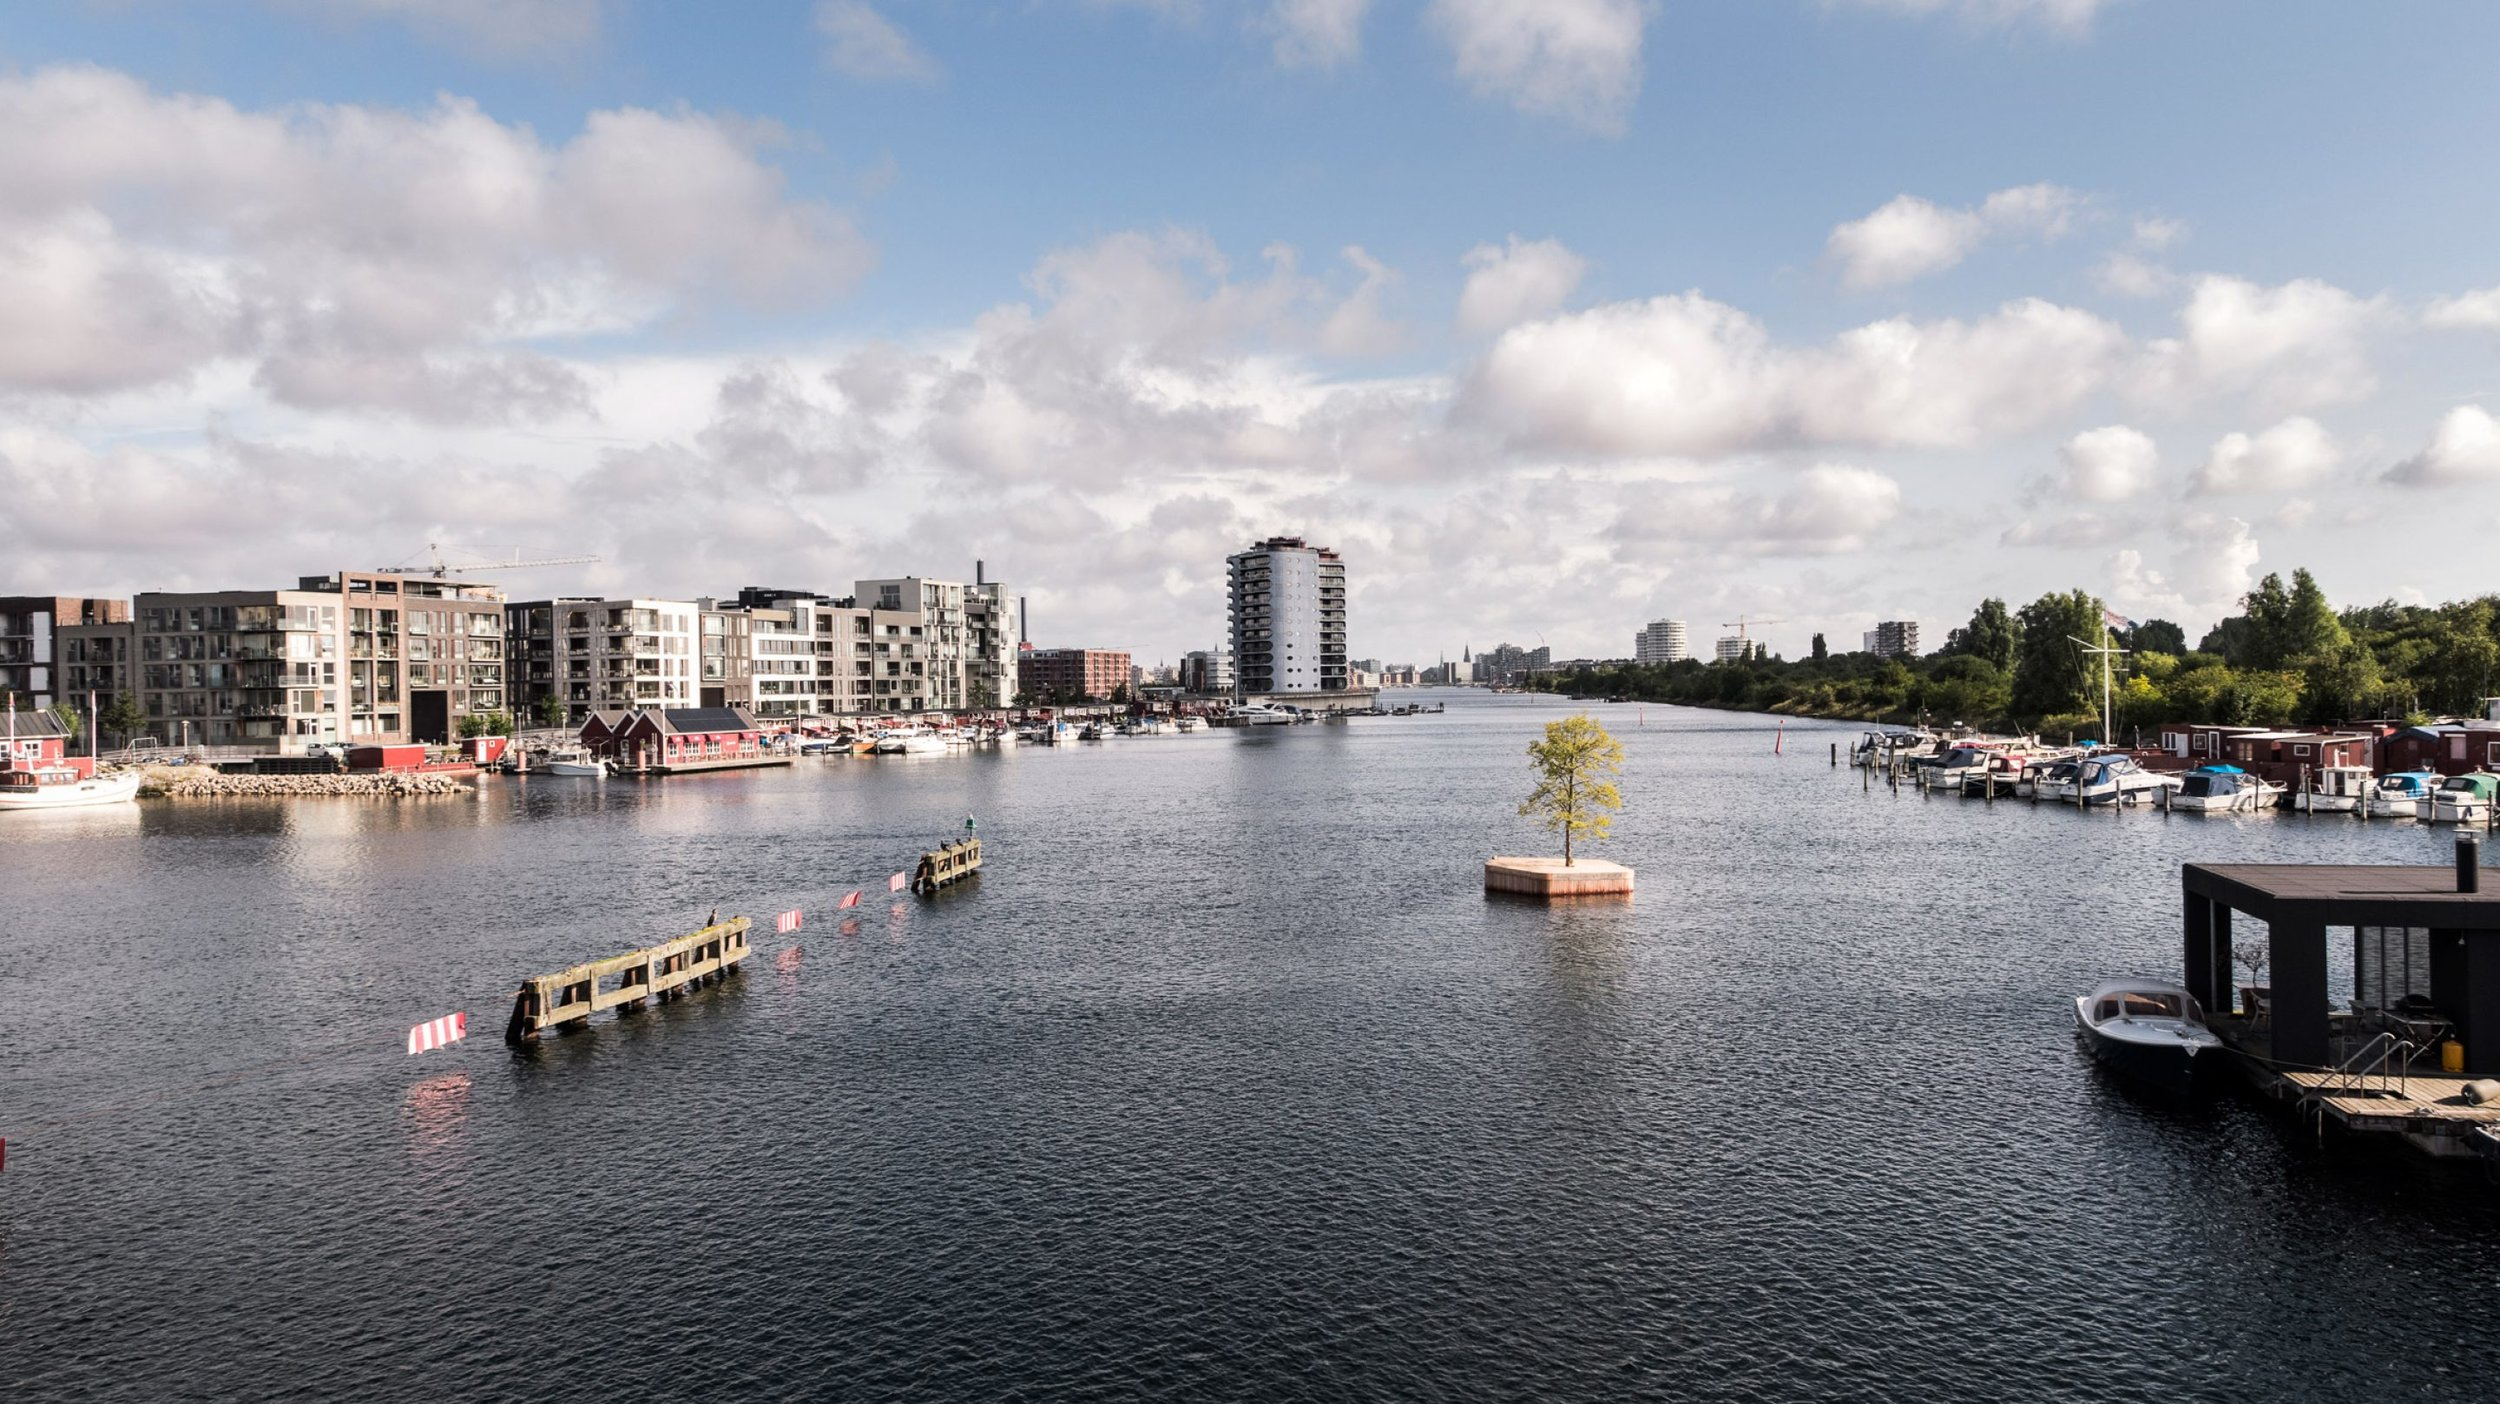 ignant-architecture-marshall-blecher-magnus-maarbjerg-copenhagen-floating-island-003-2880x1617.jpg